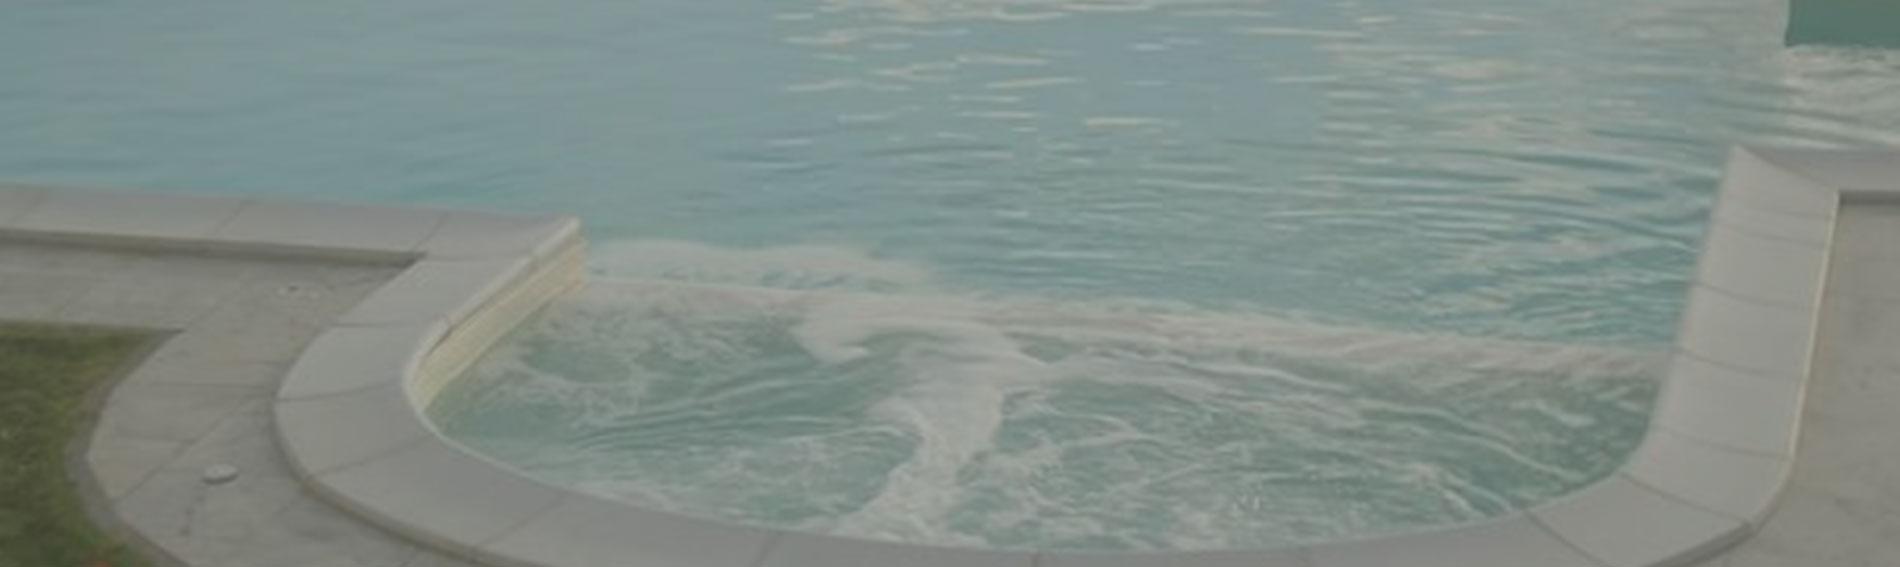 slide piscina idromassaggio acquafer